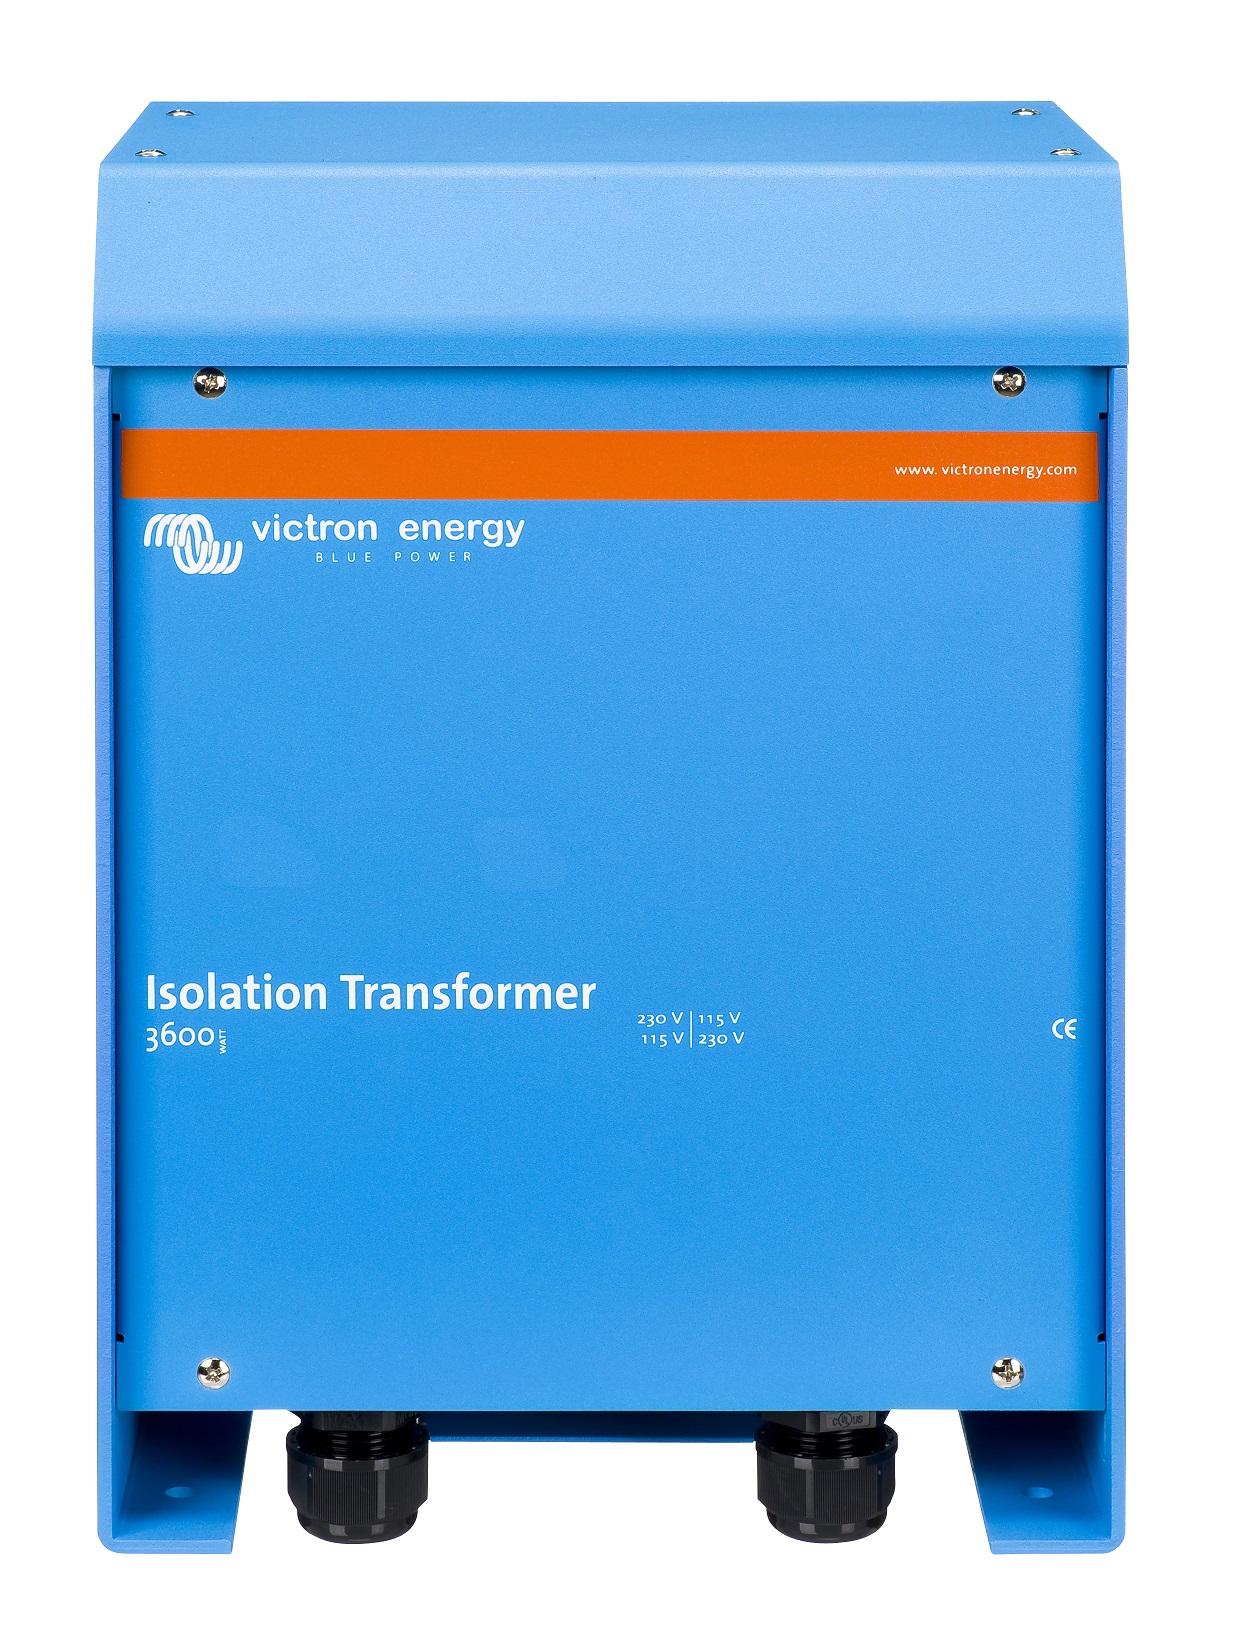 Isolation_Transformer_2000W_left_ITR040362041